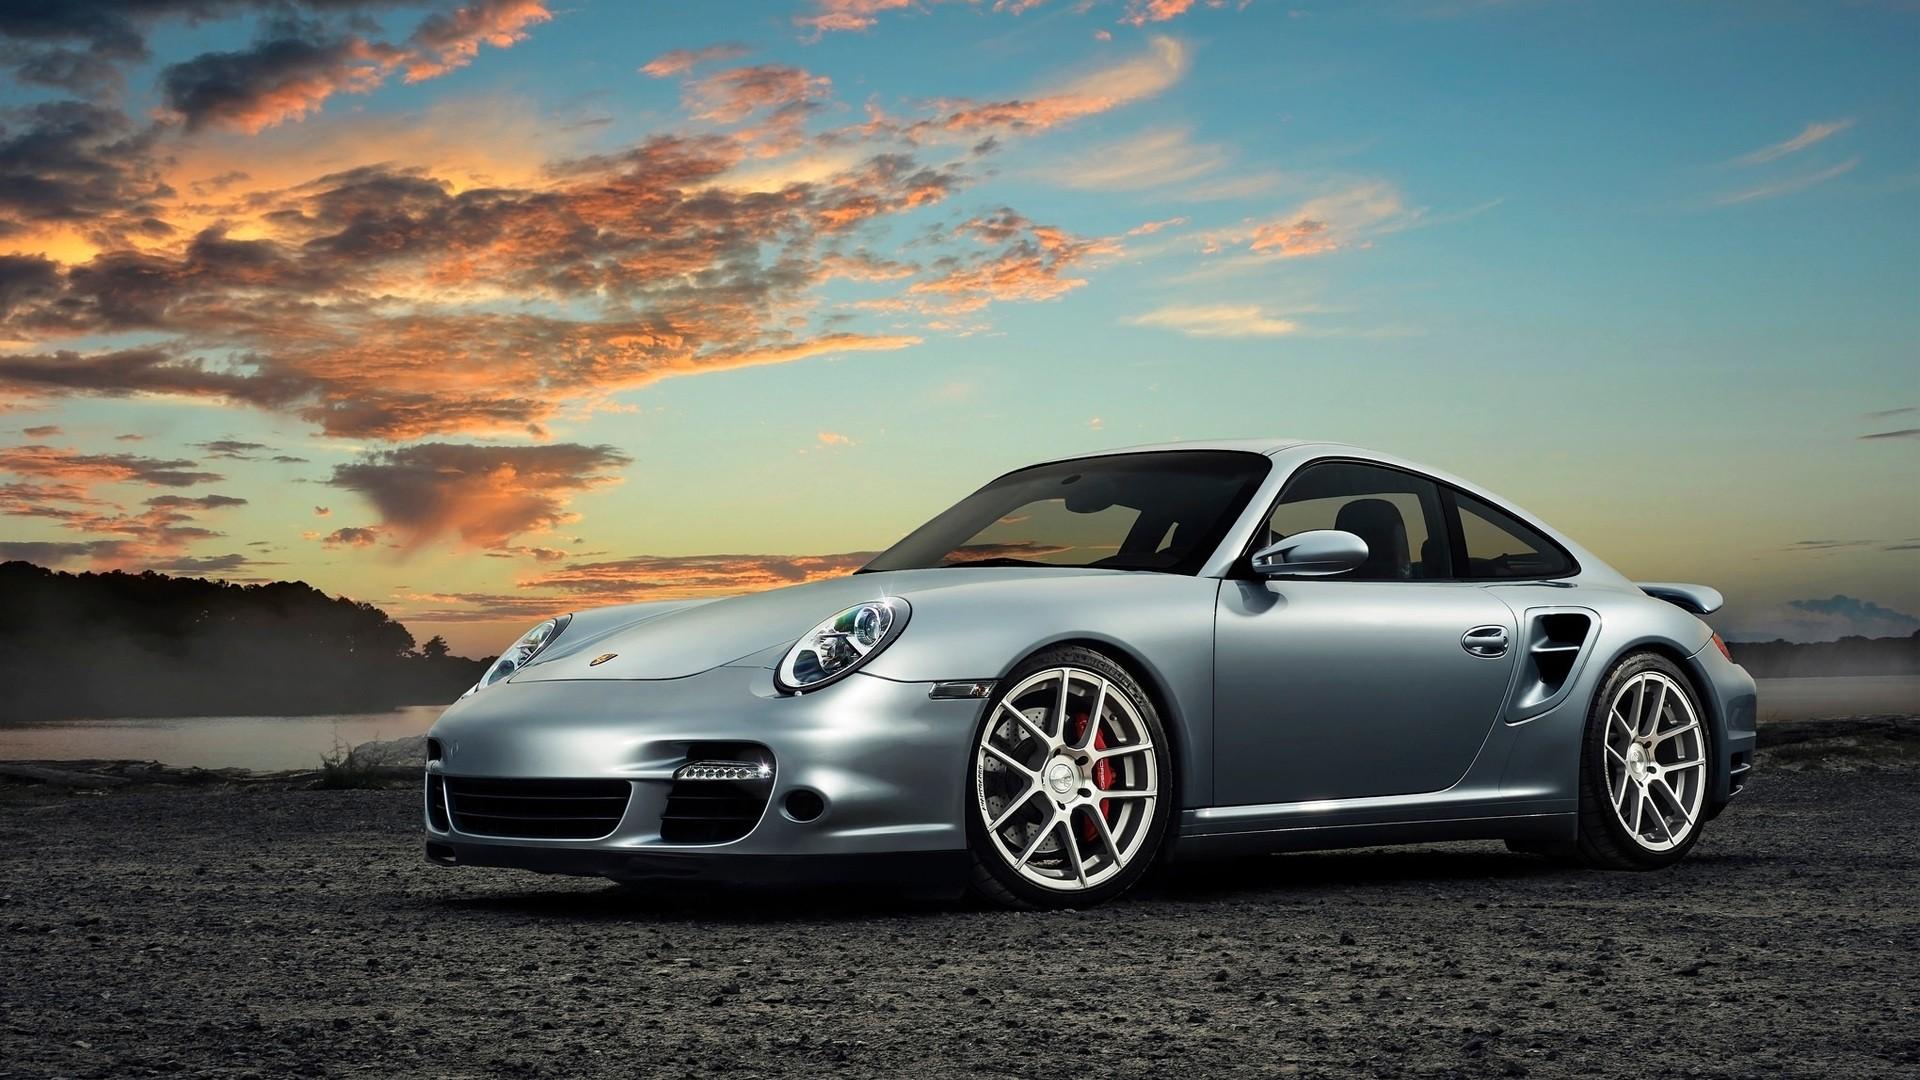 Porsche 911 Turbo Avant Garde Wallpaper Hd Car